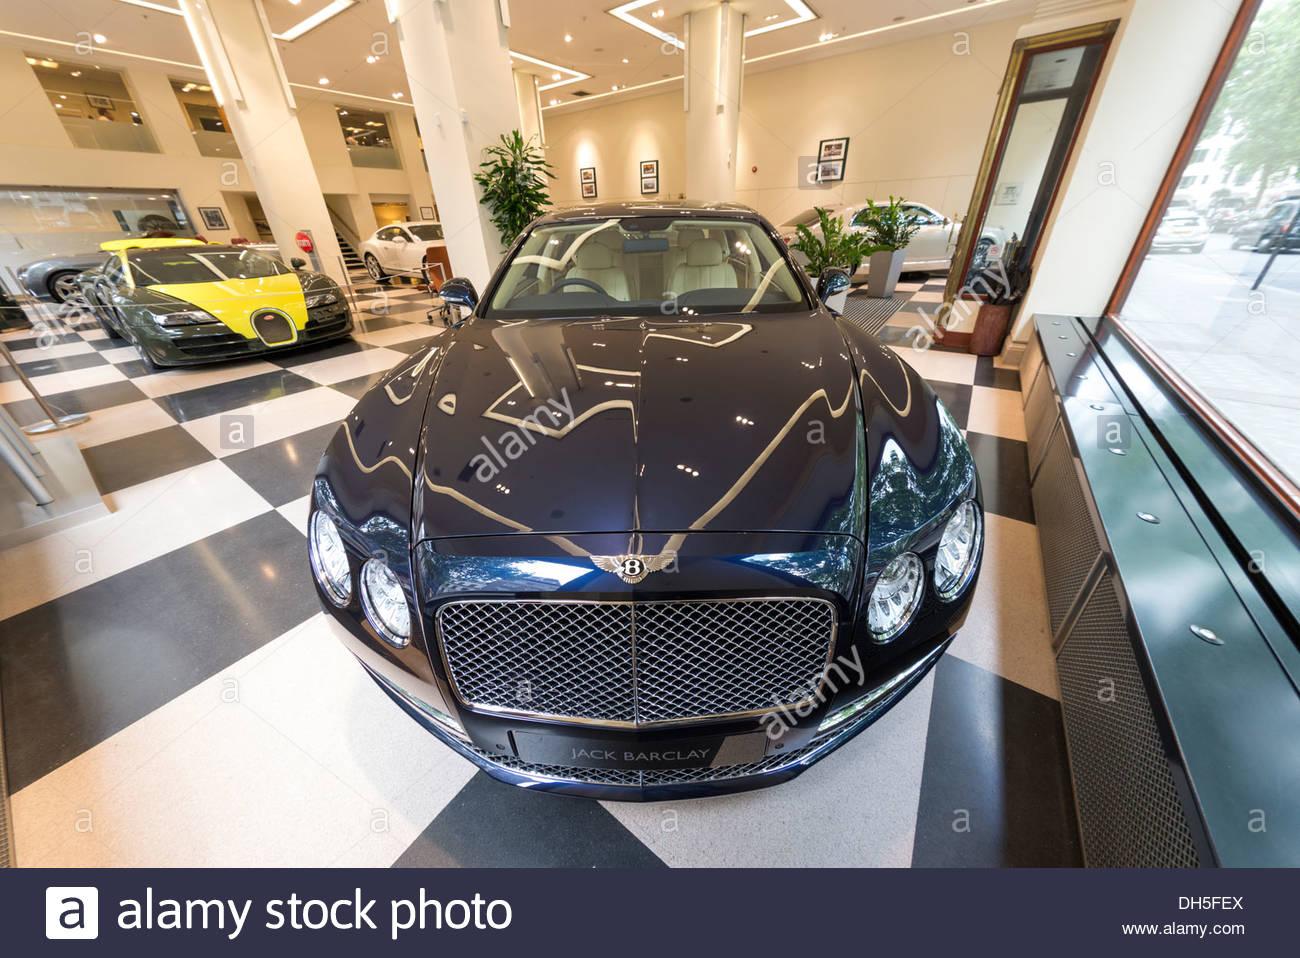 Jack Barclay Bentley car showroom in Berkeley Square, Mayfair, London, England, UK - Stock Image